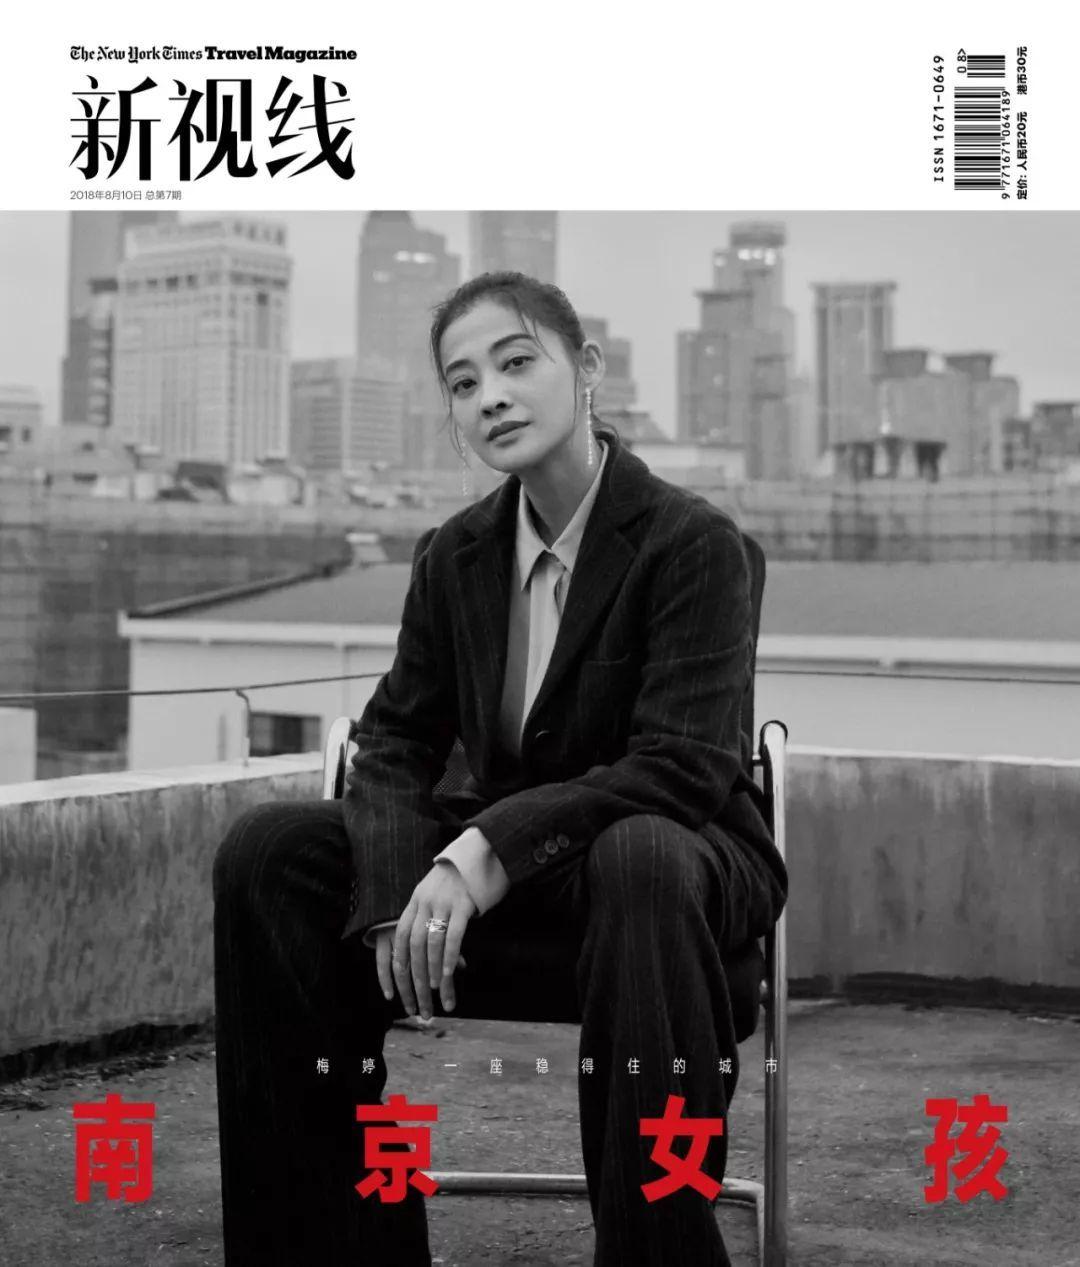 《NY Times Travel新视线》南京女孩-梅婷